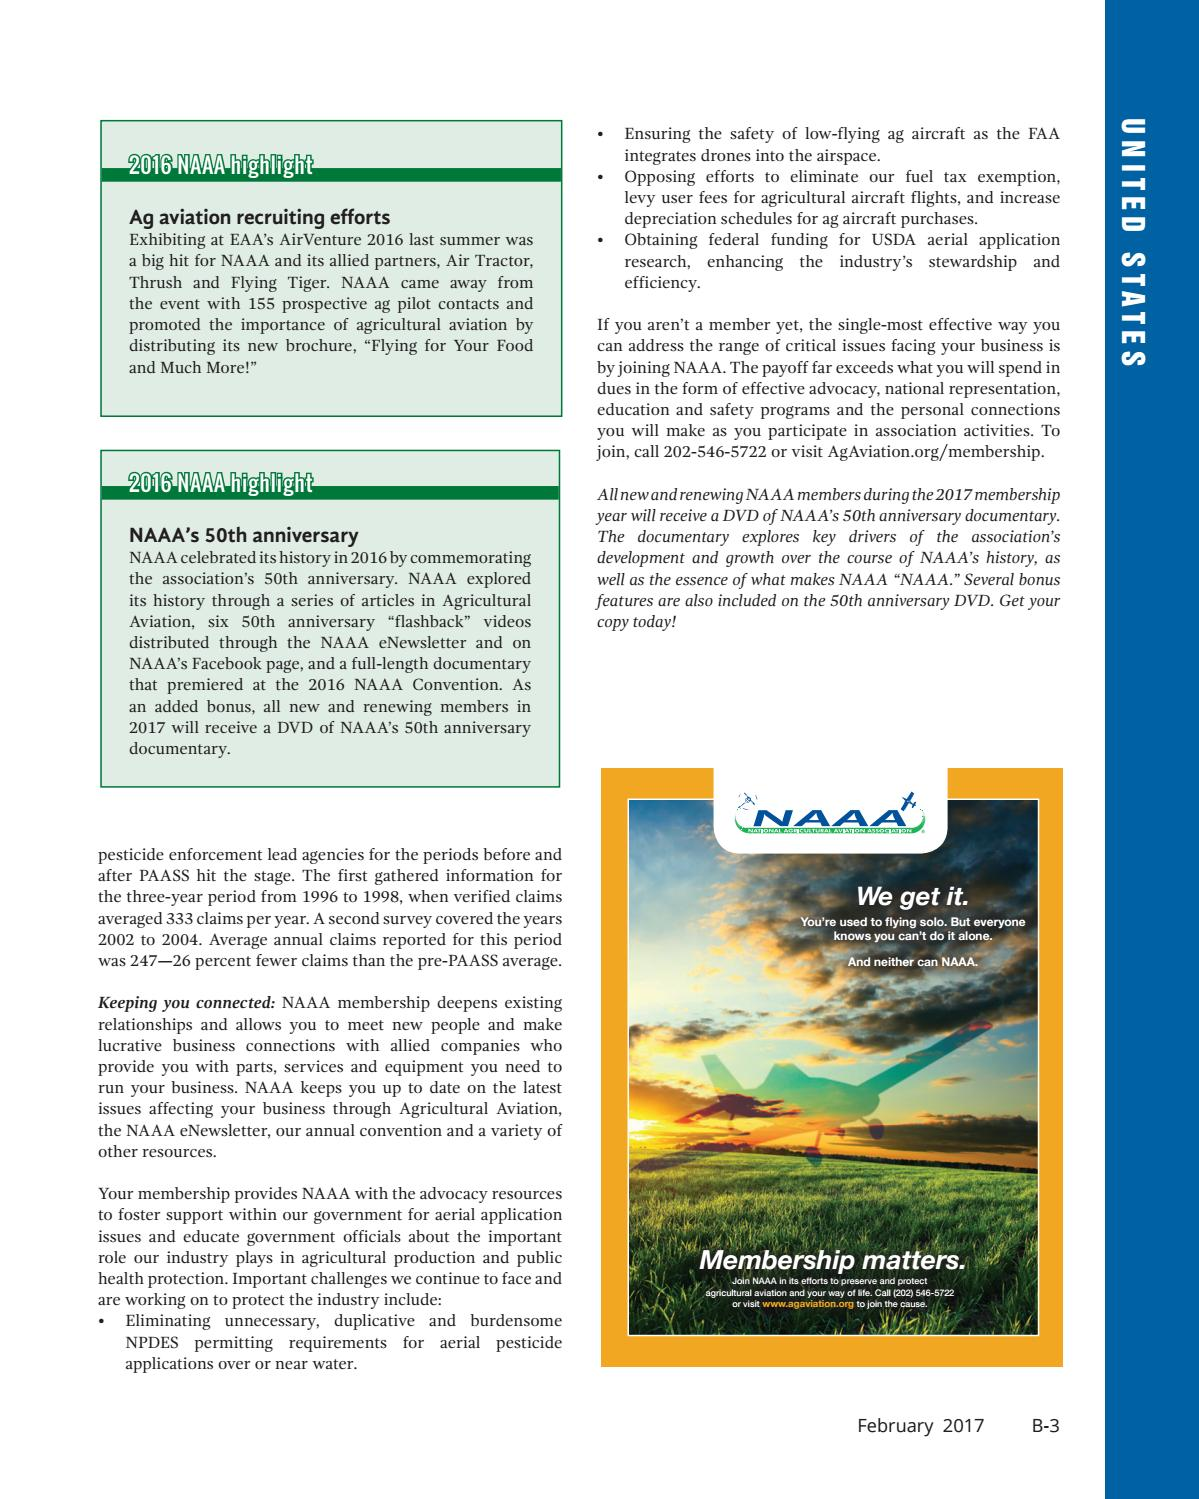 February 2017 - U S  Edition in English by AgAir Update - issuu